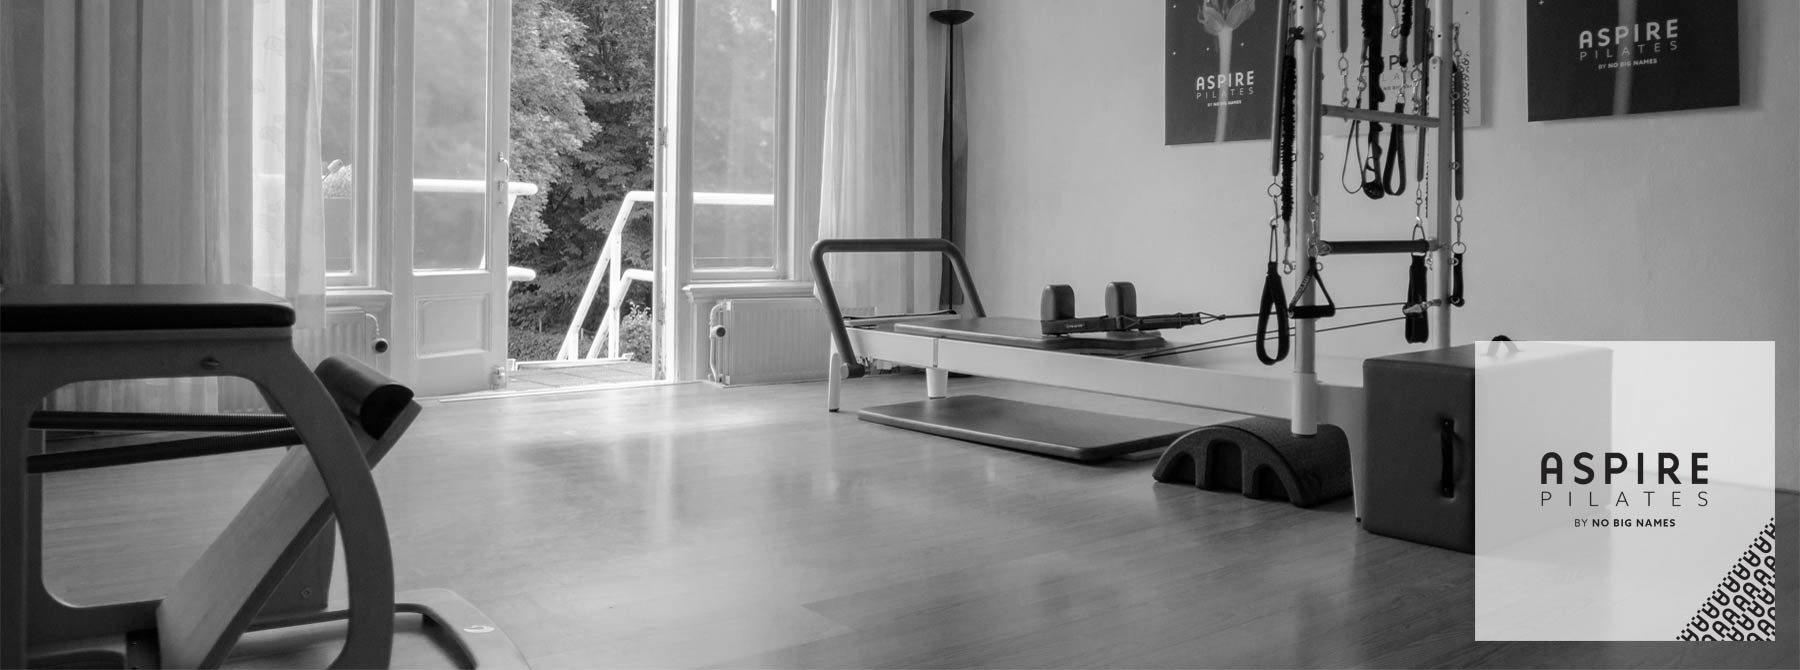 ASPIRE Pilates